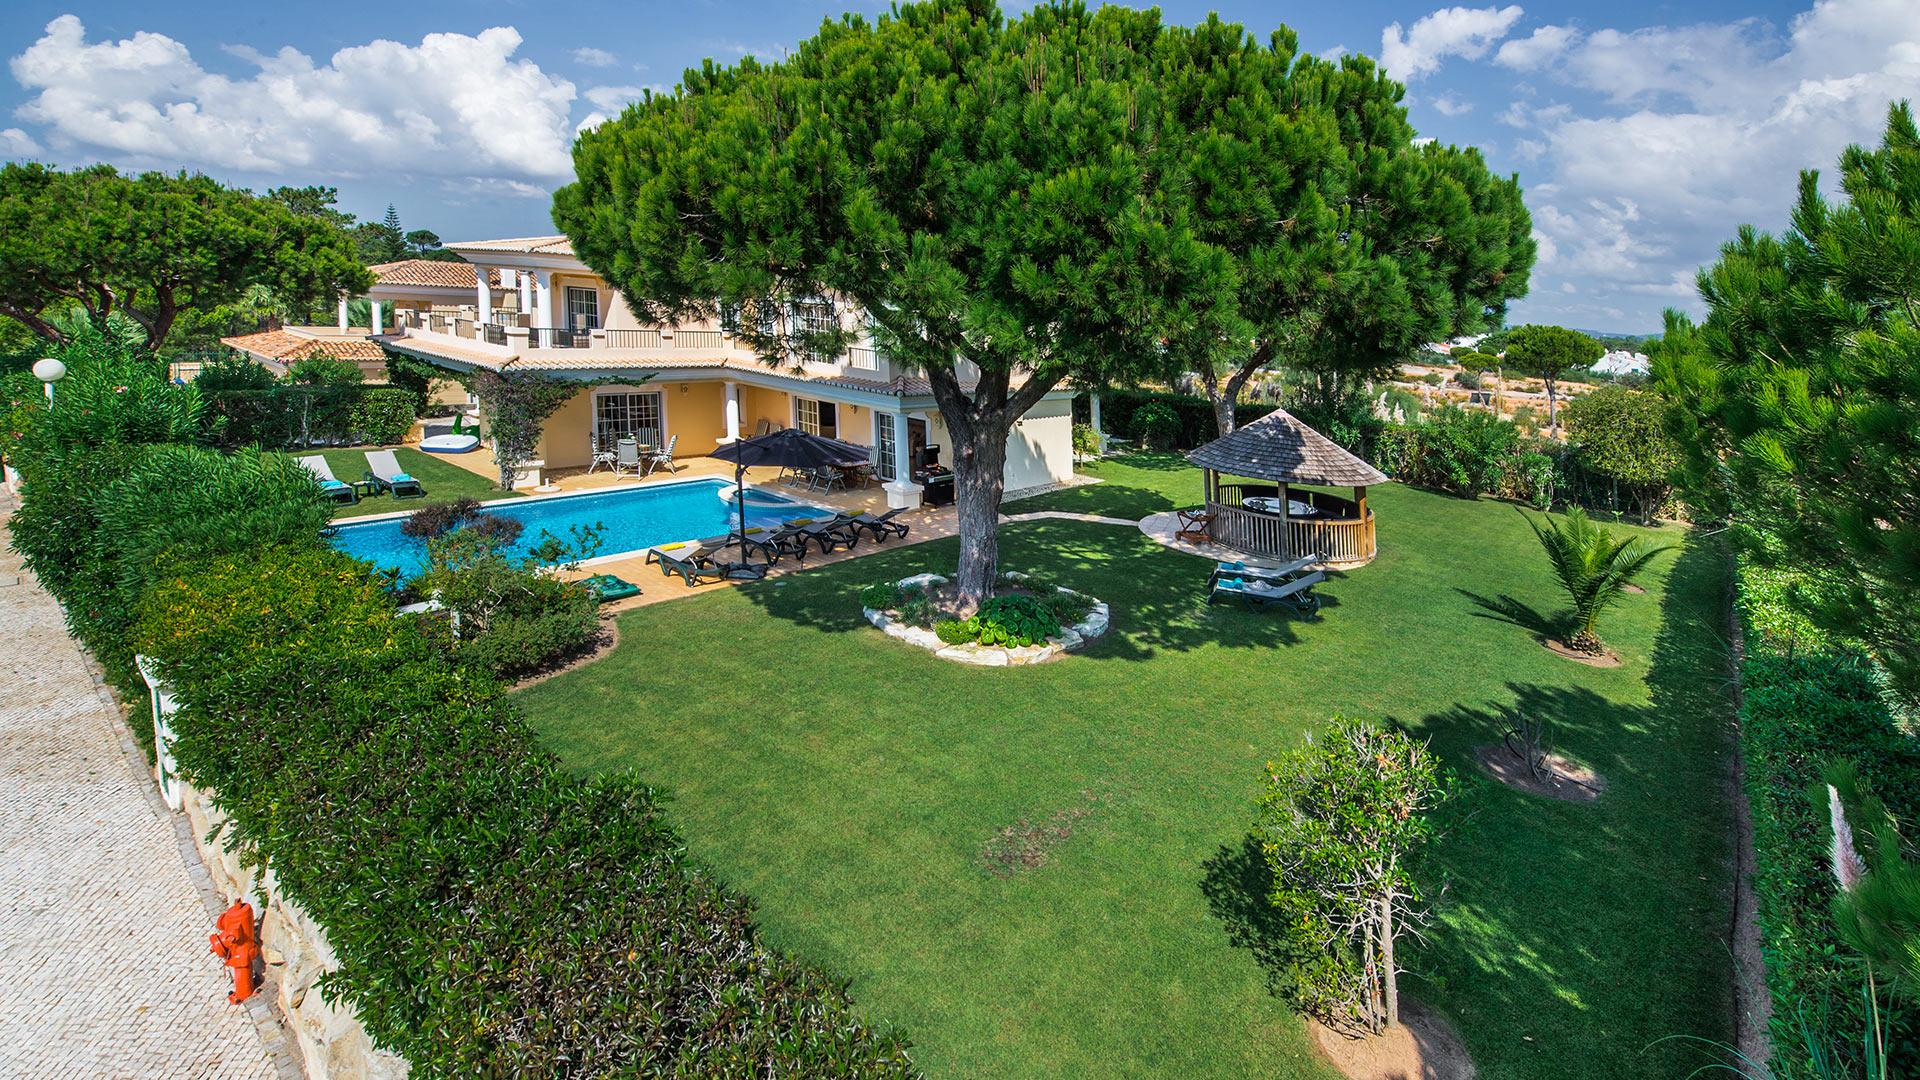 Villa Villa Costala, Rental in Algarve